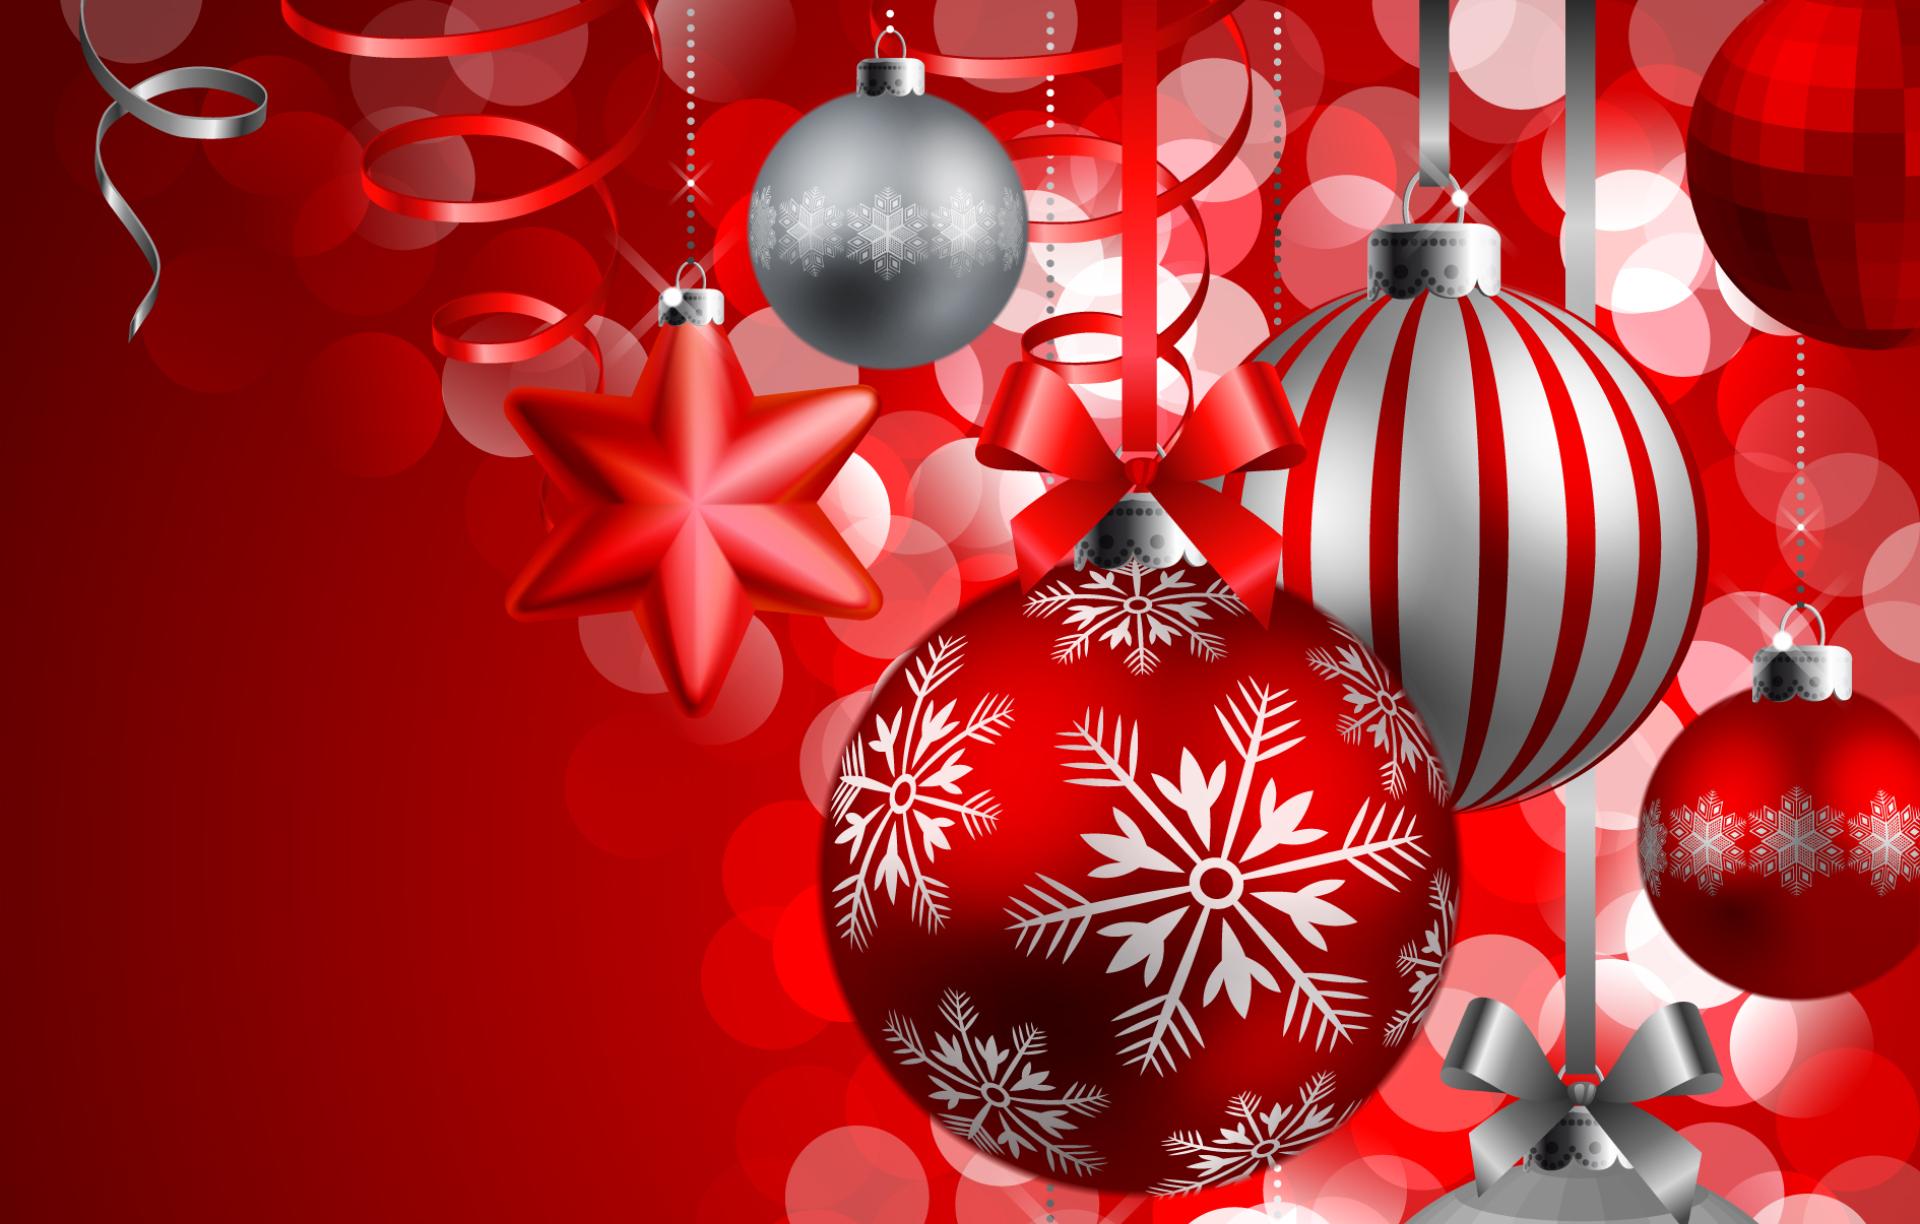 Merry Christmas  Christmas Photo 32793655  Fanpop